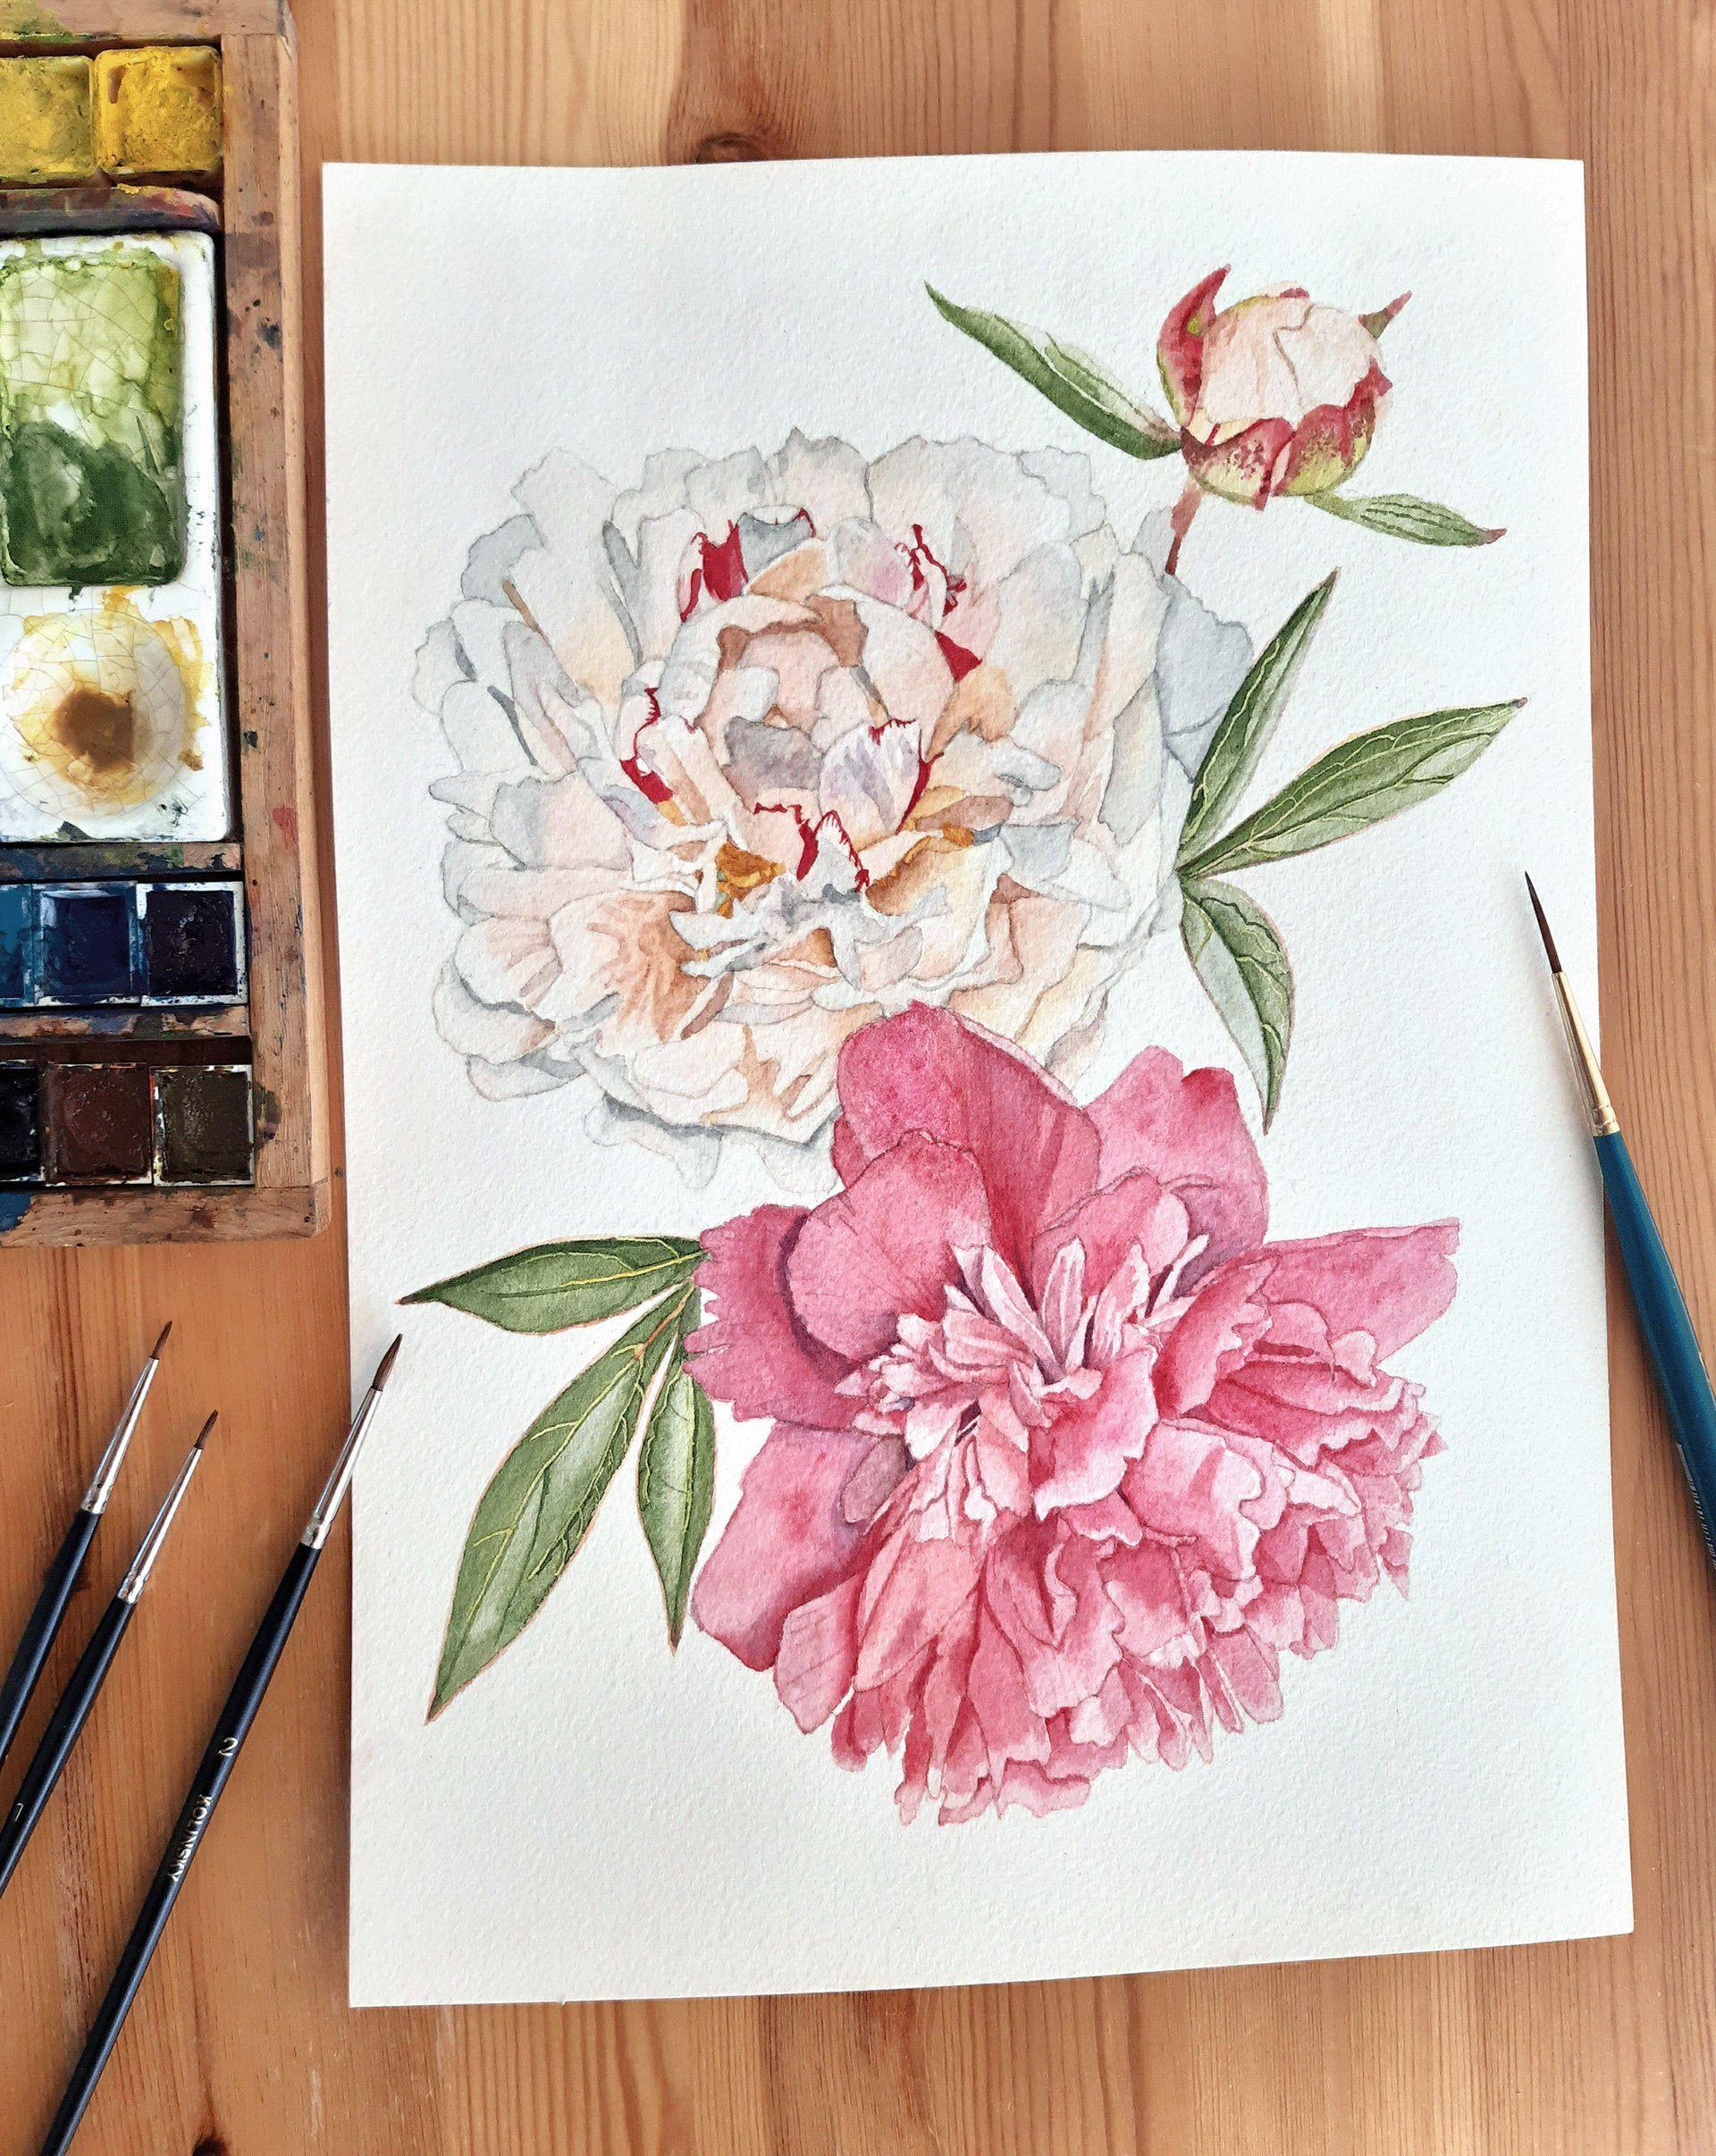 Watercolor painting of white and pink peonies. #watercolorart #peonies #floralart